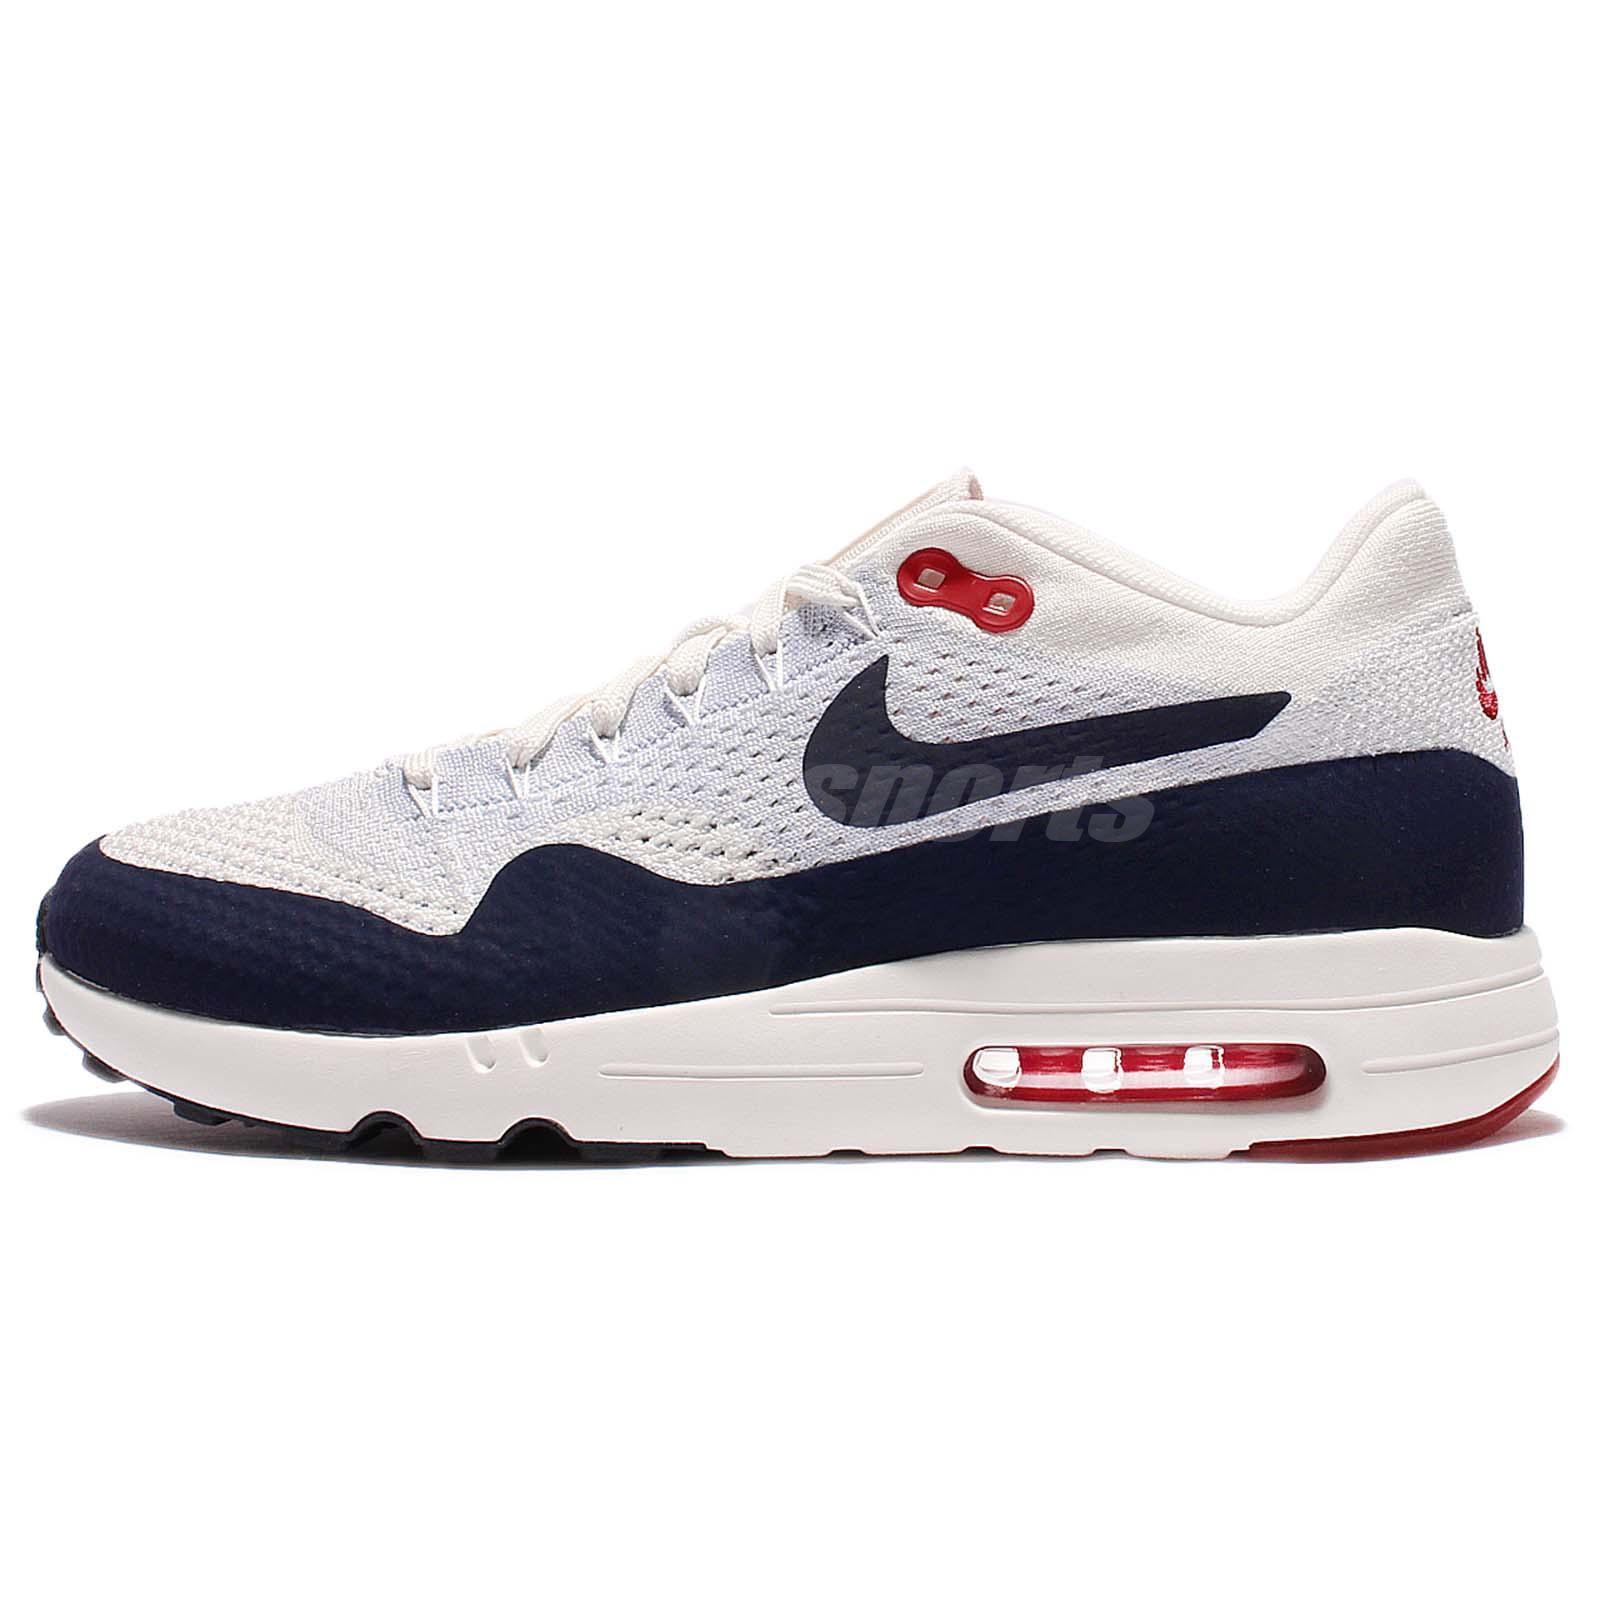 best value 17de0 02816 ... Nike Air Max 1 Ultra 2.0 Flyknit Obsidian Men Running Shoes Sneakers  875942-100 ...